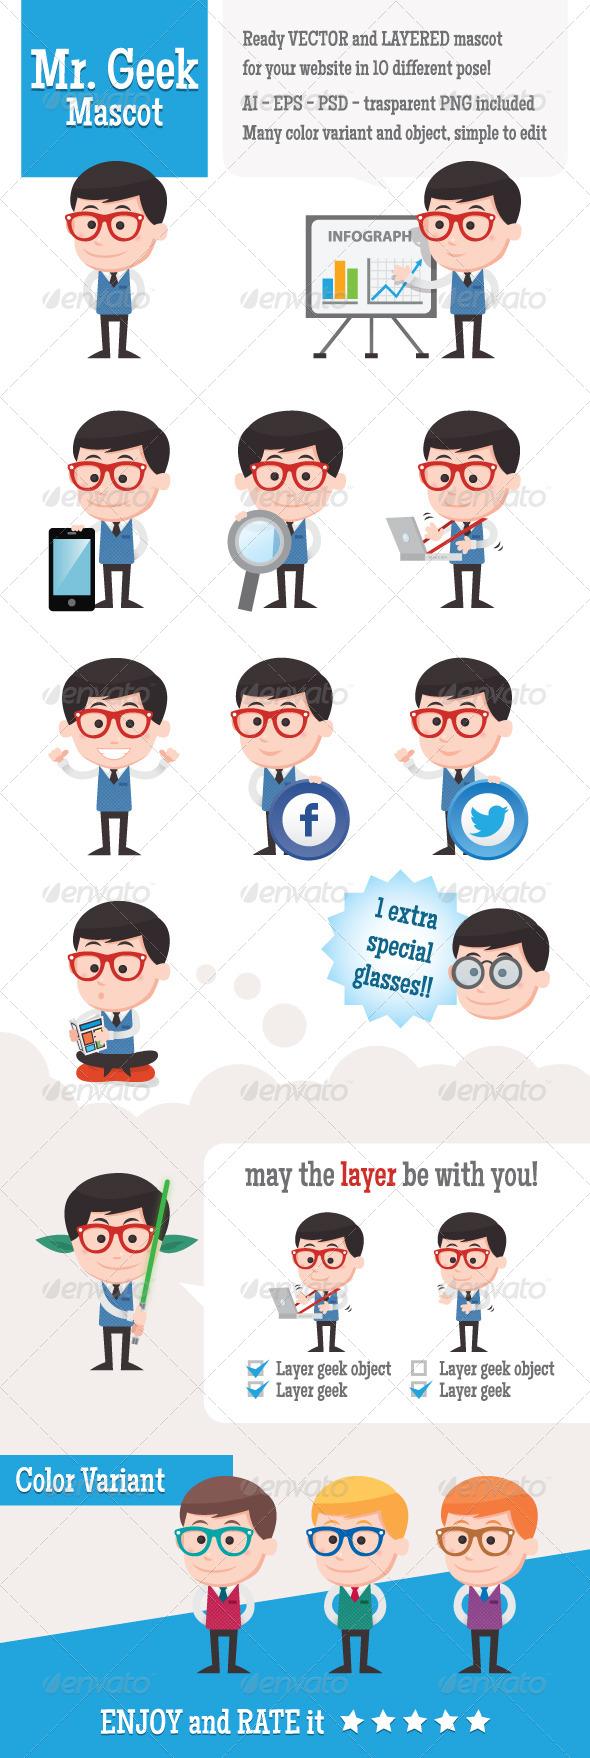 GraphicRiver Mr Geek Mascot 4822964